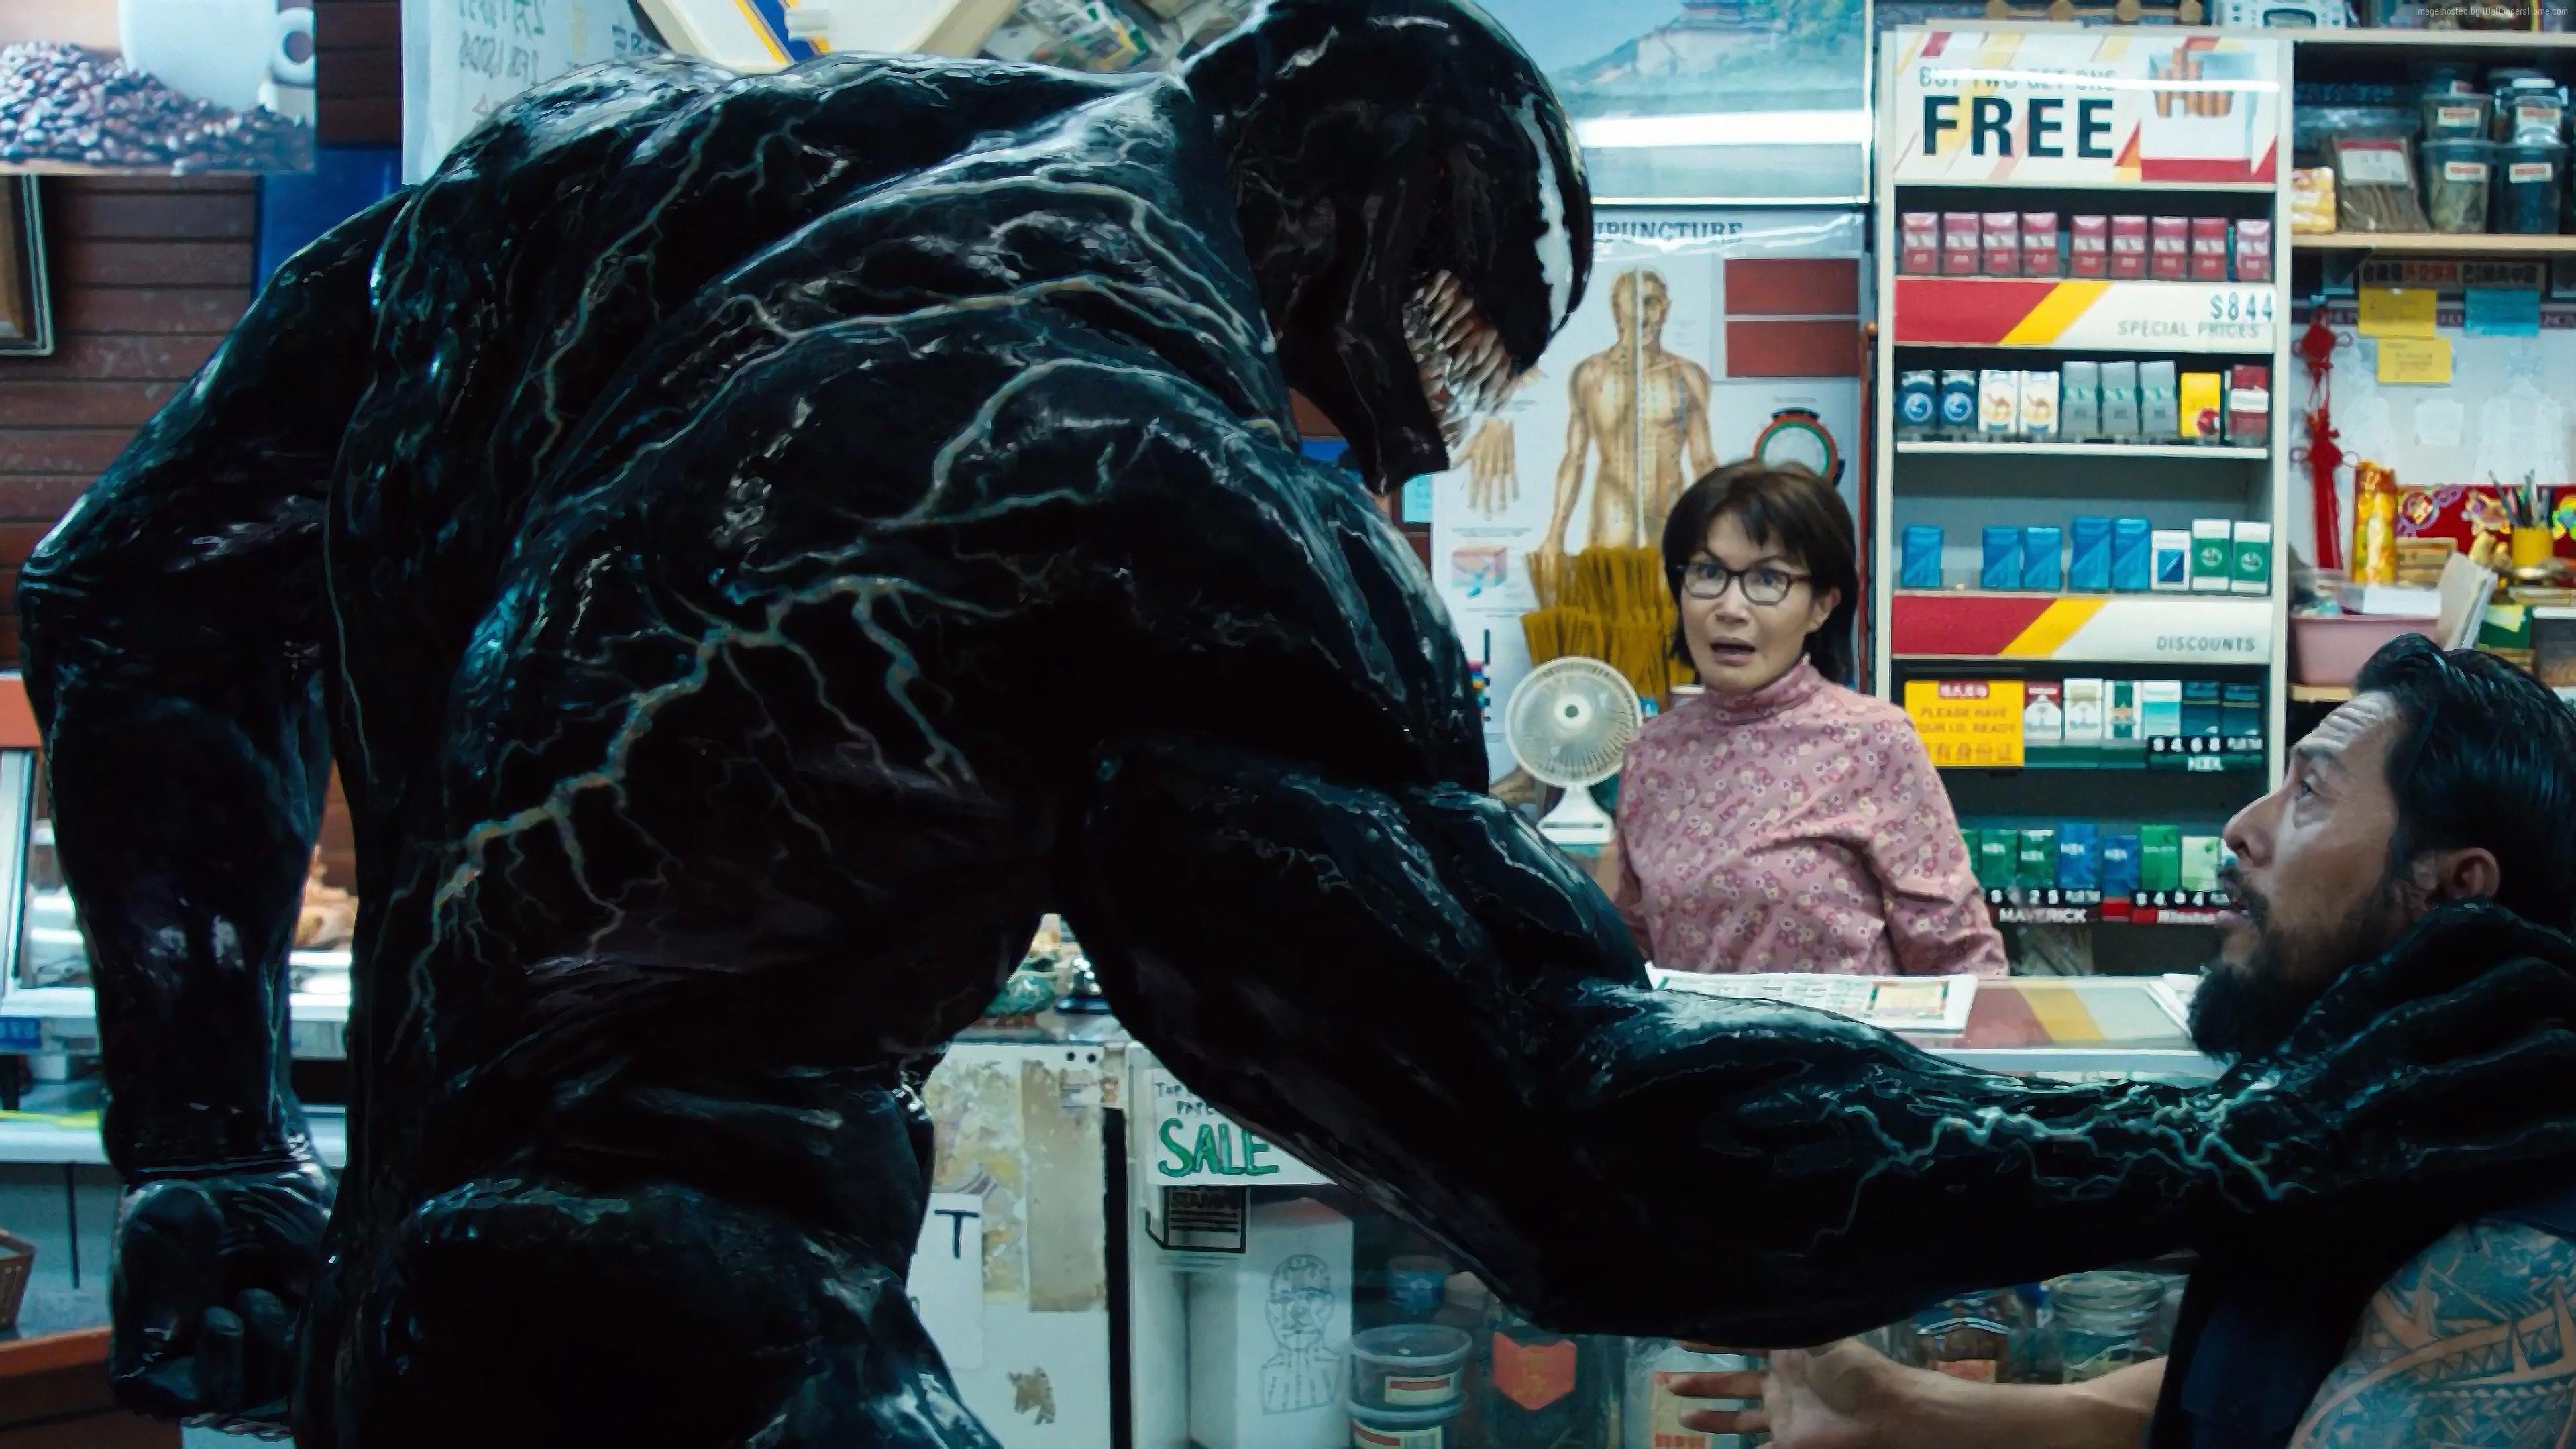 2048x2048 Venom 2018 Movie 4k Ipad Air Hd 4k Wallpapers: Wallpaper Venom, Tom Hardy, 4K, Movies 4k, Tom Hardy